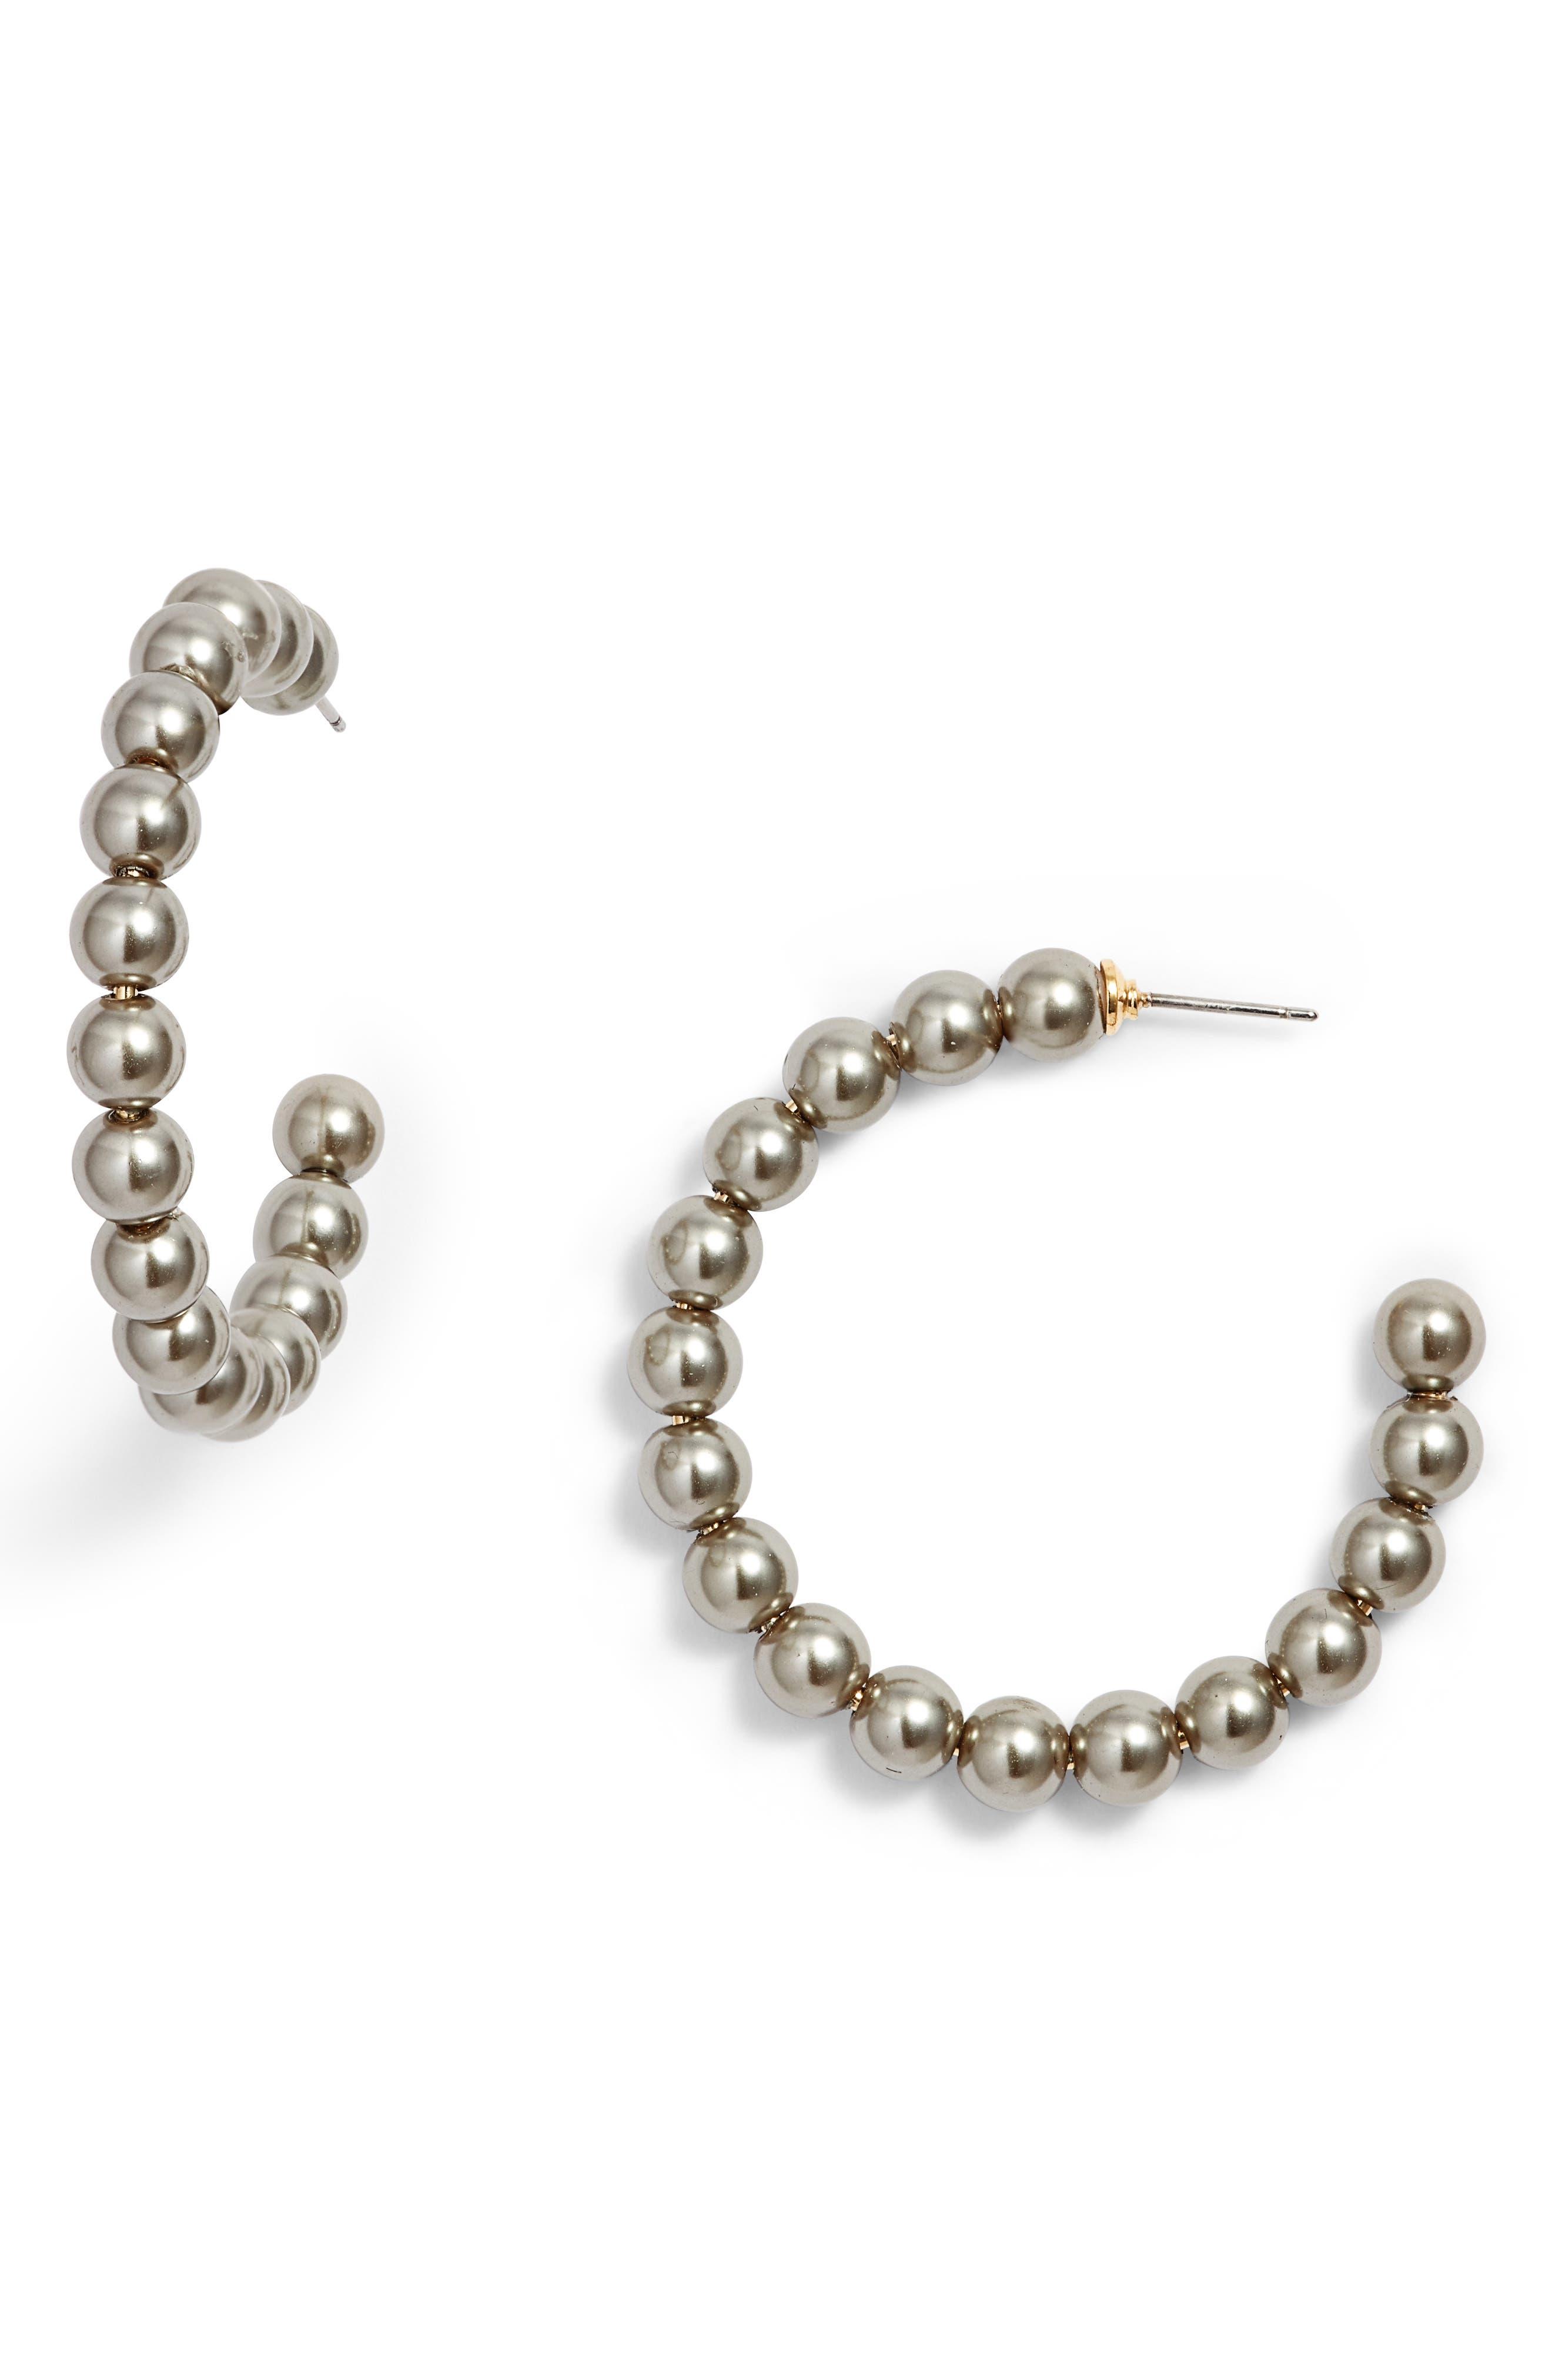 Confetti Imitation Pearl Hoops,                         Main,                         color, Black Pearl